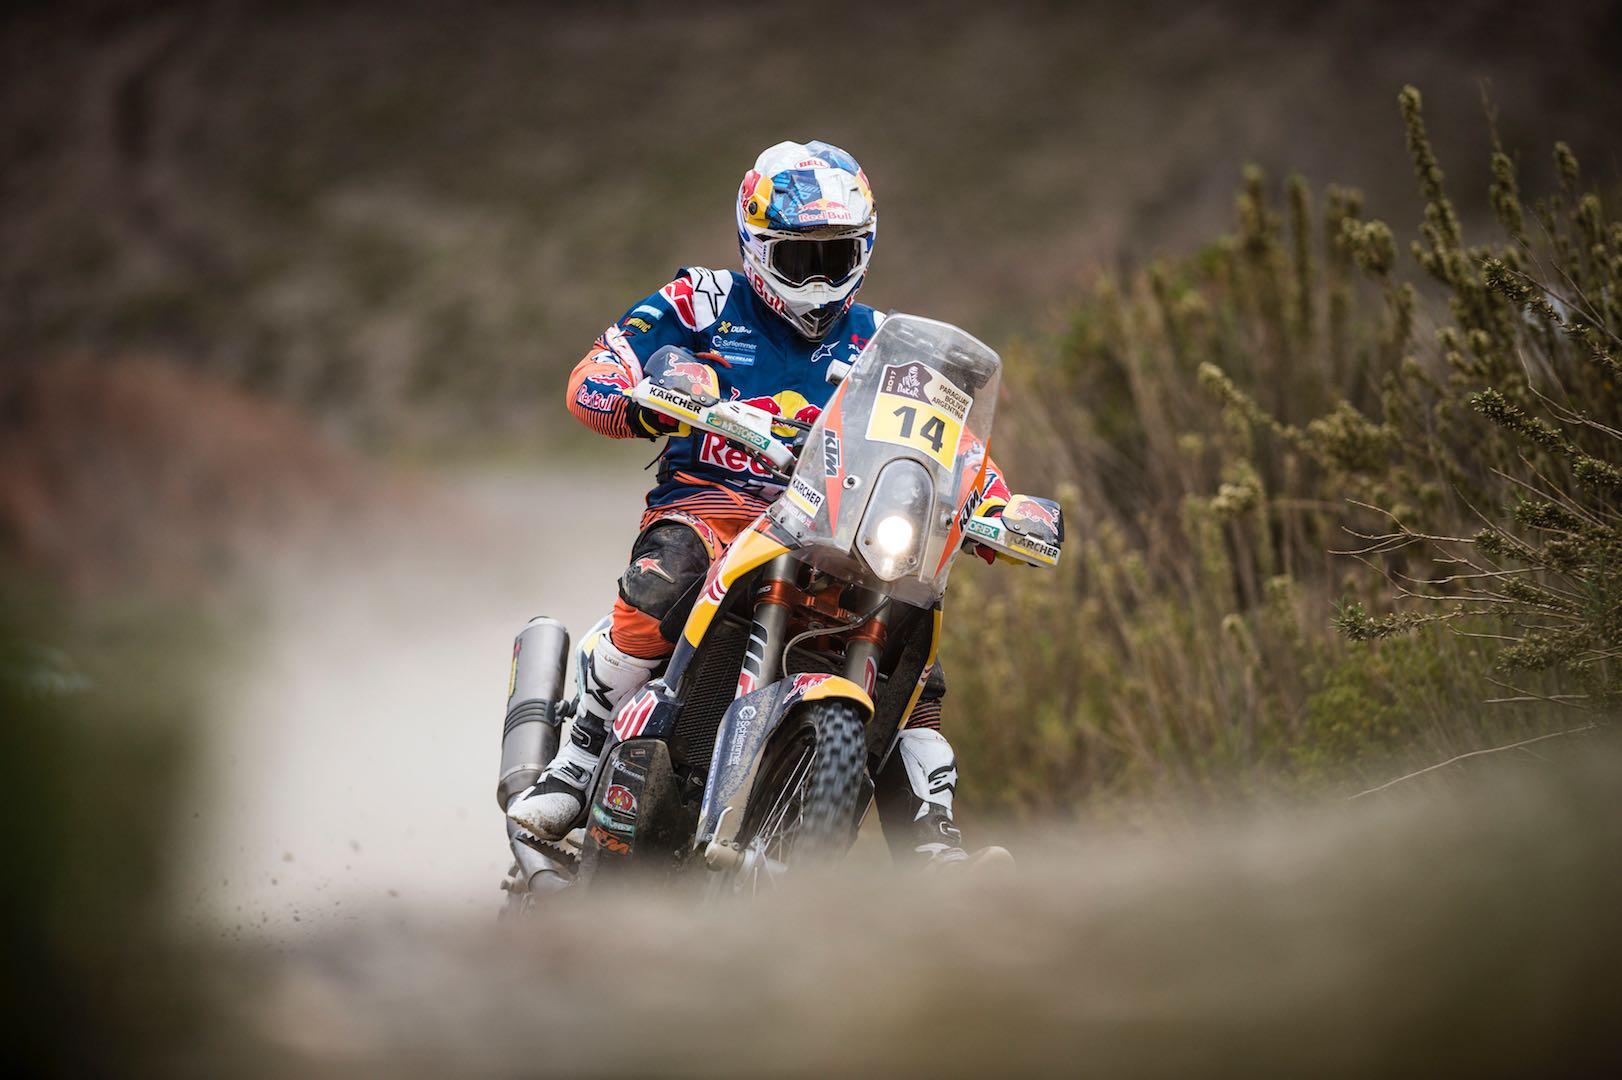 2017 Dakar Rally Stage 5 Motorcycles Ktm S Sunderland S Turn